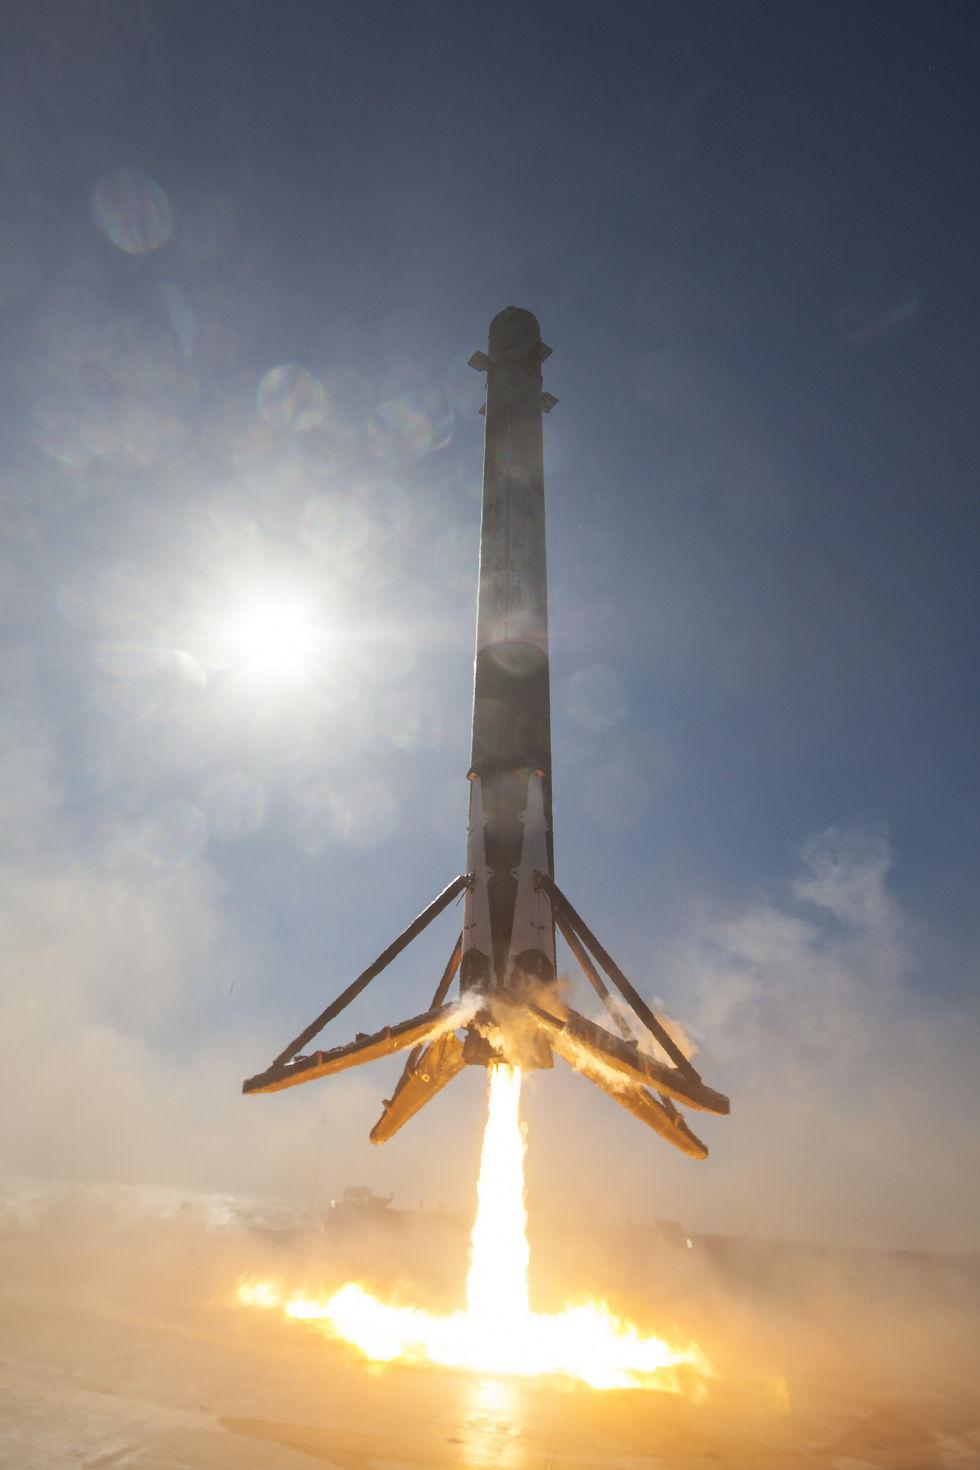 spacecraft uses - photo #17